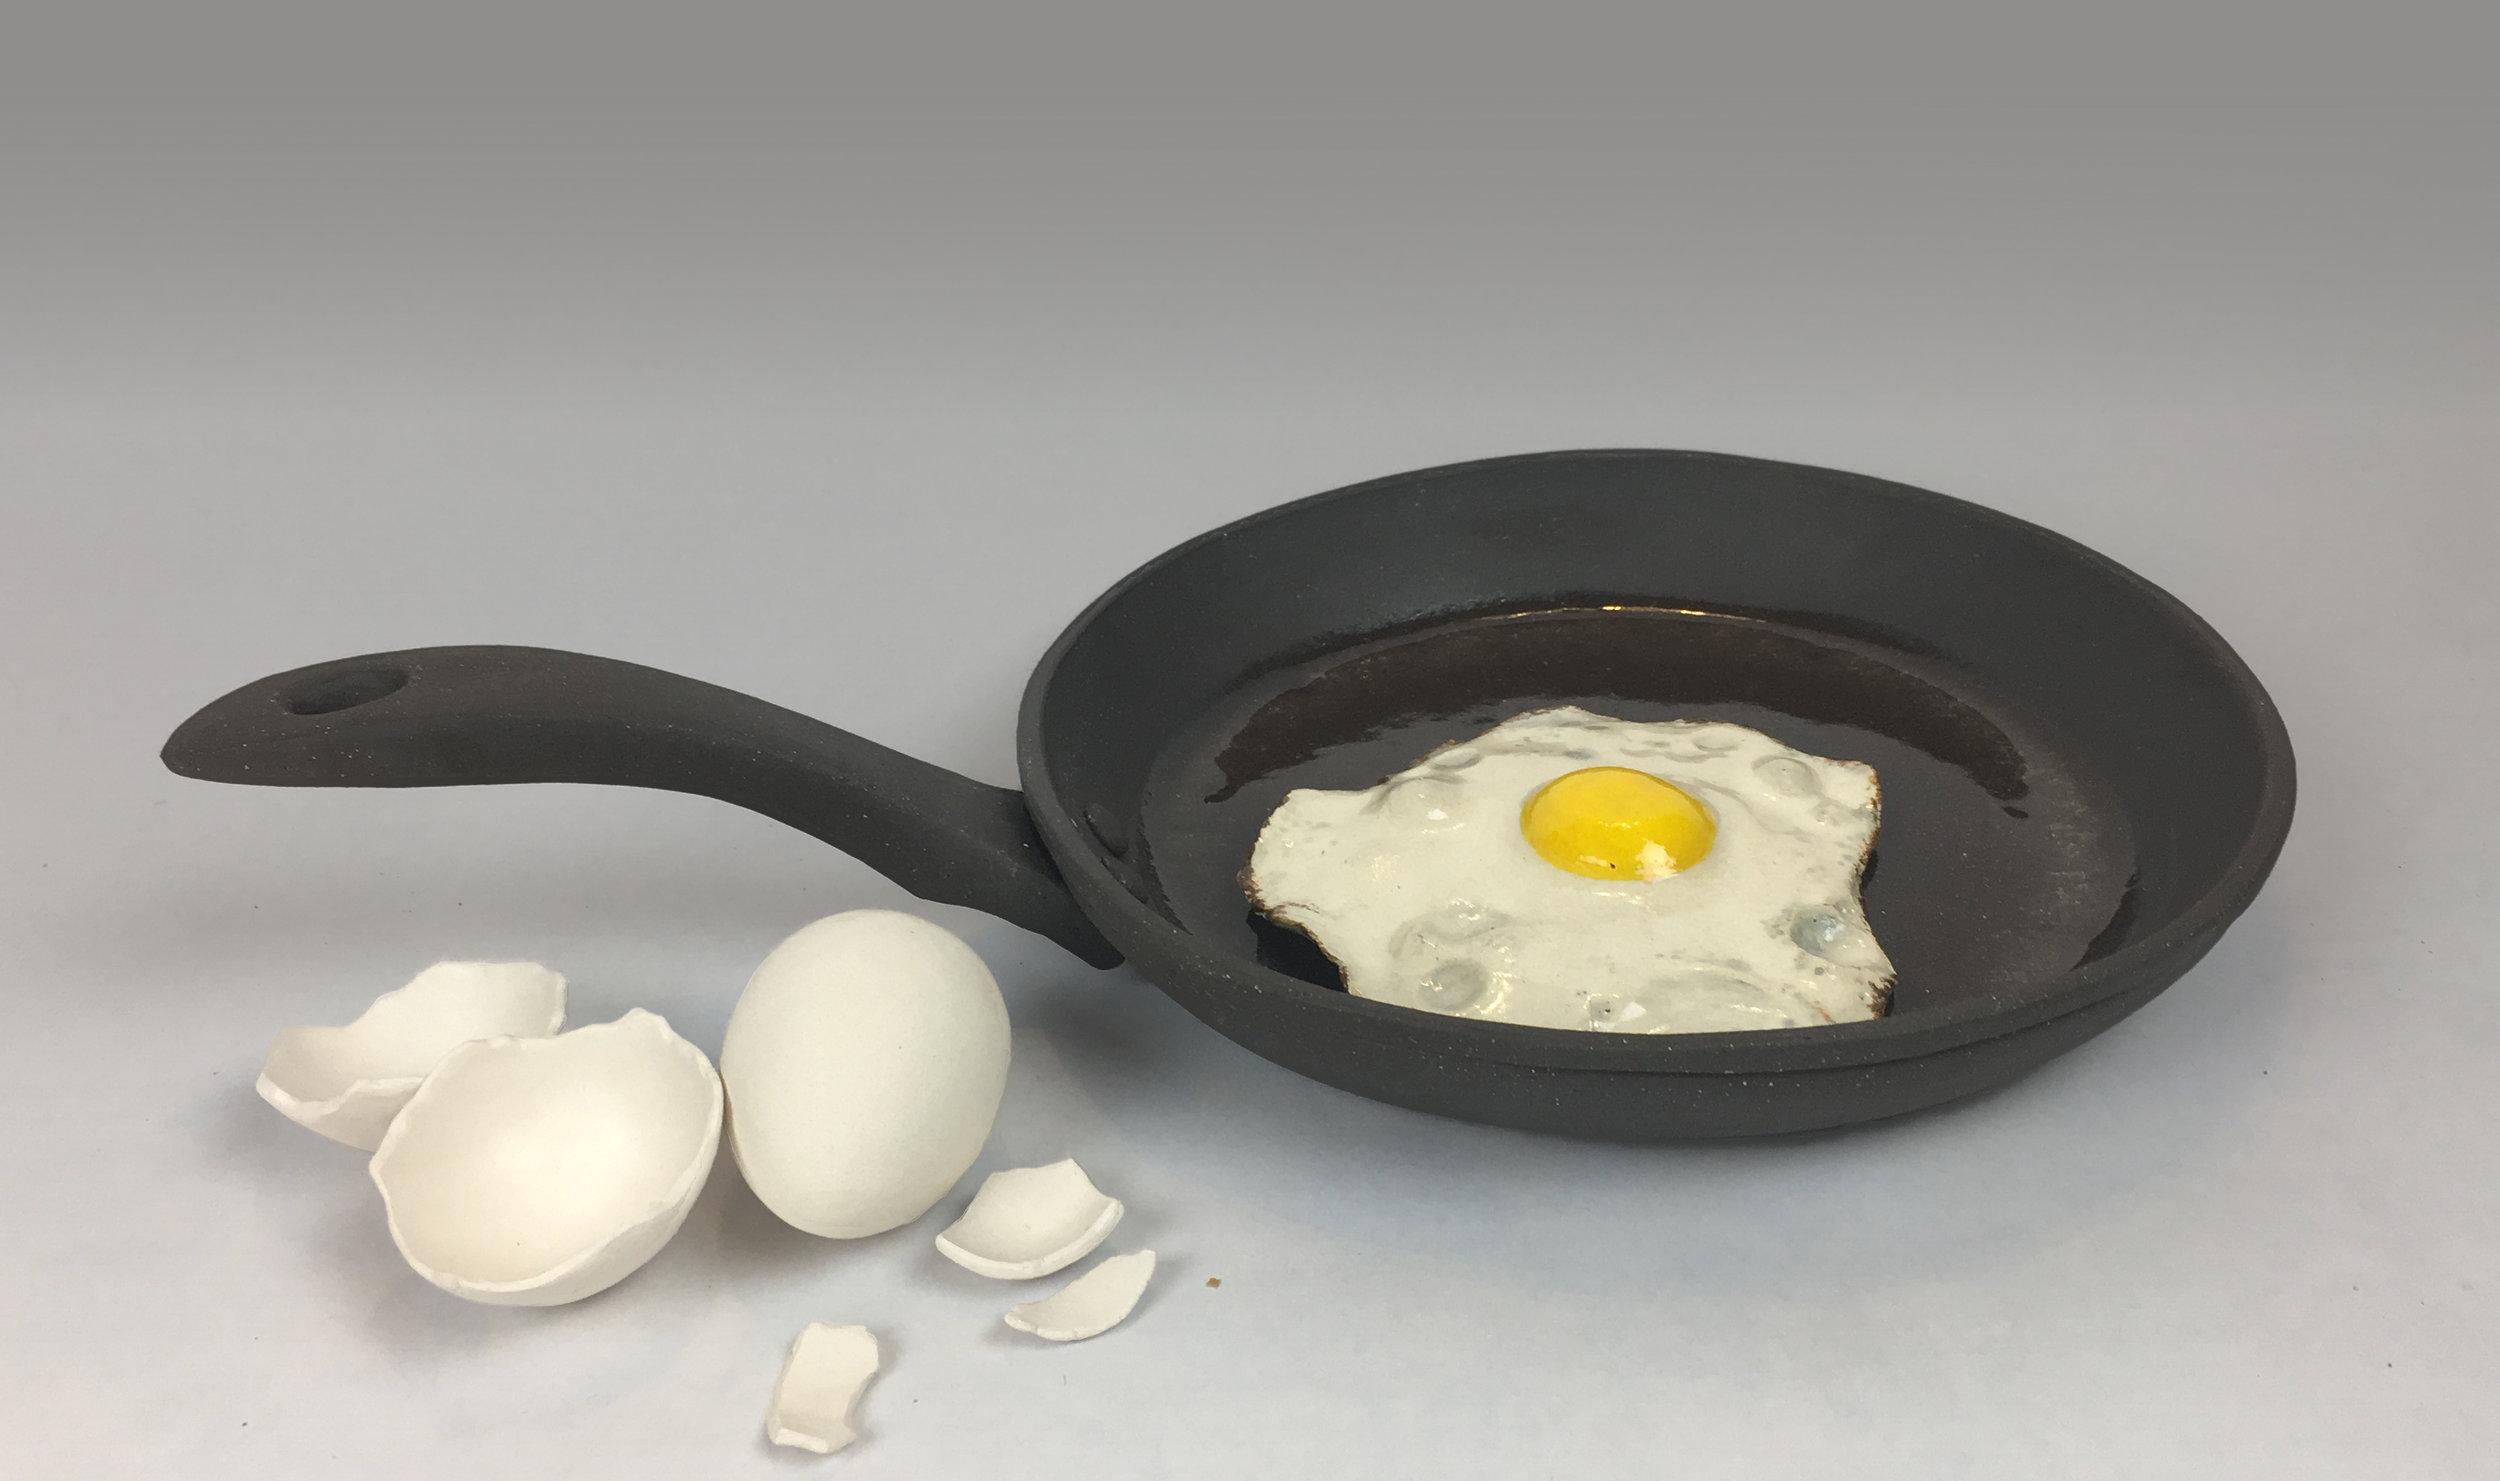 Skillet with Fried Egg